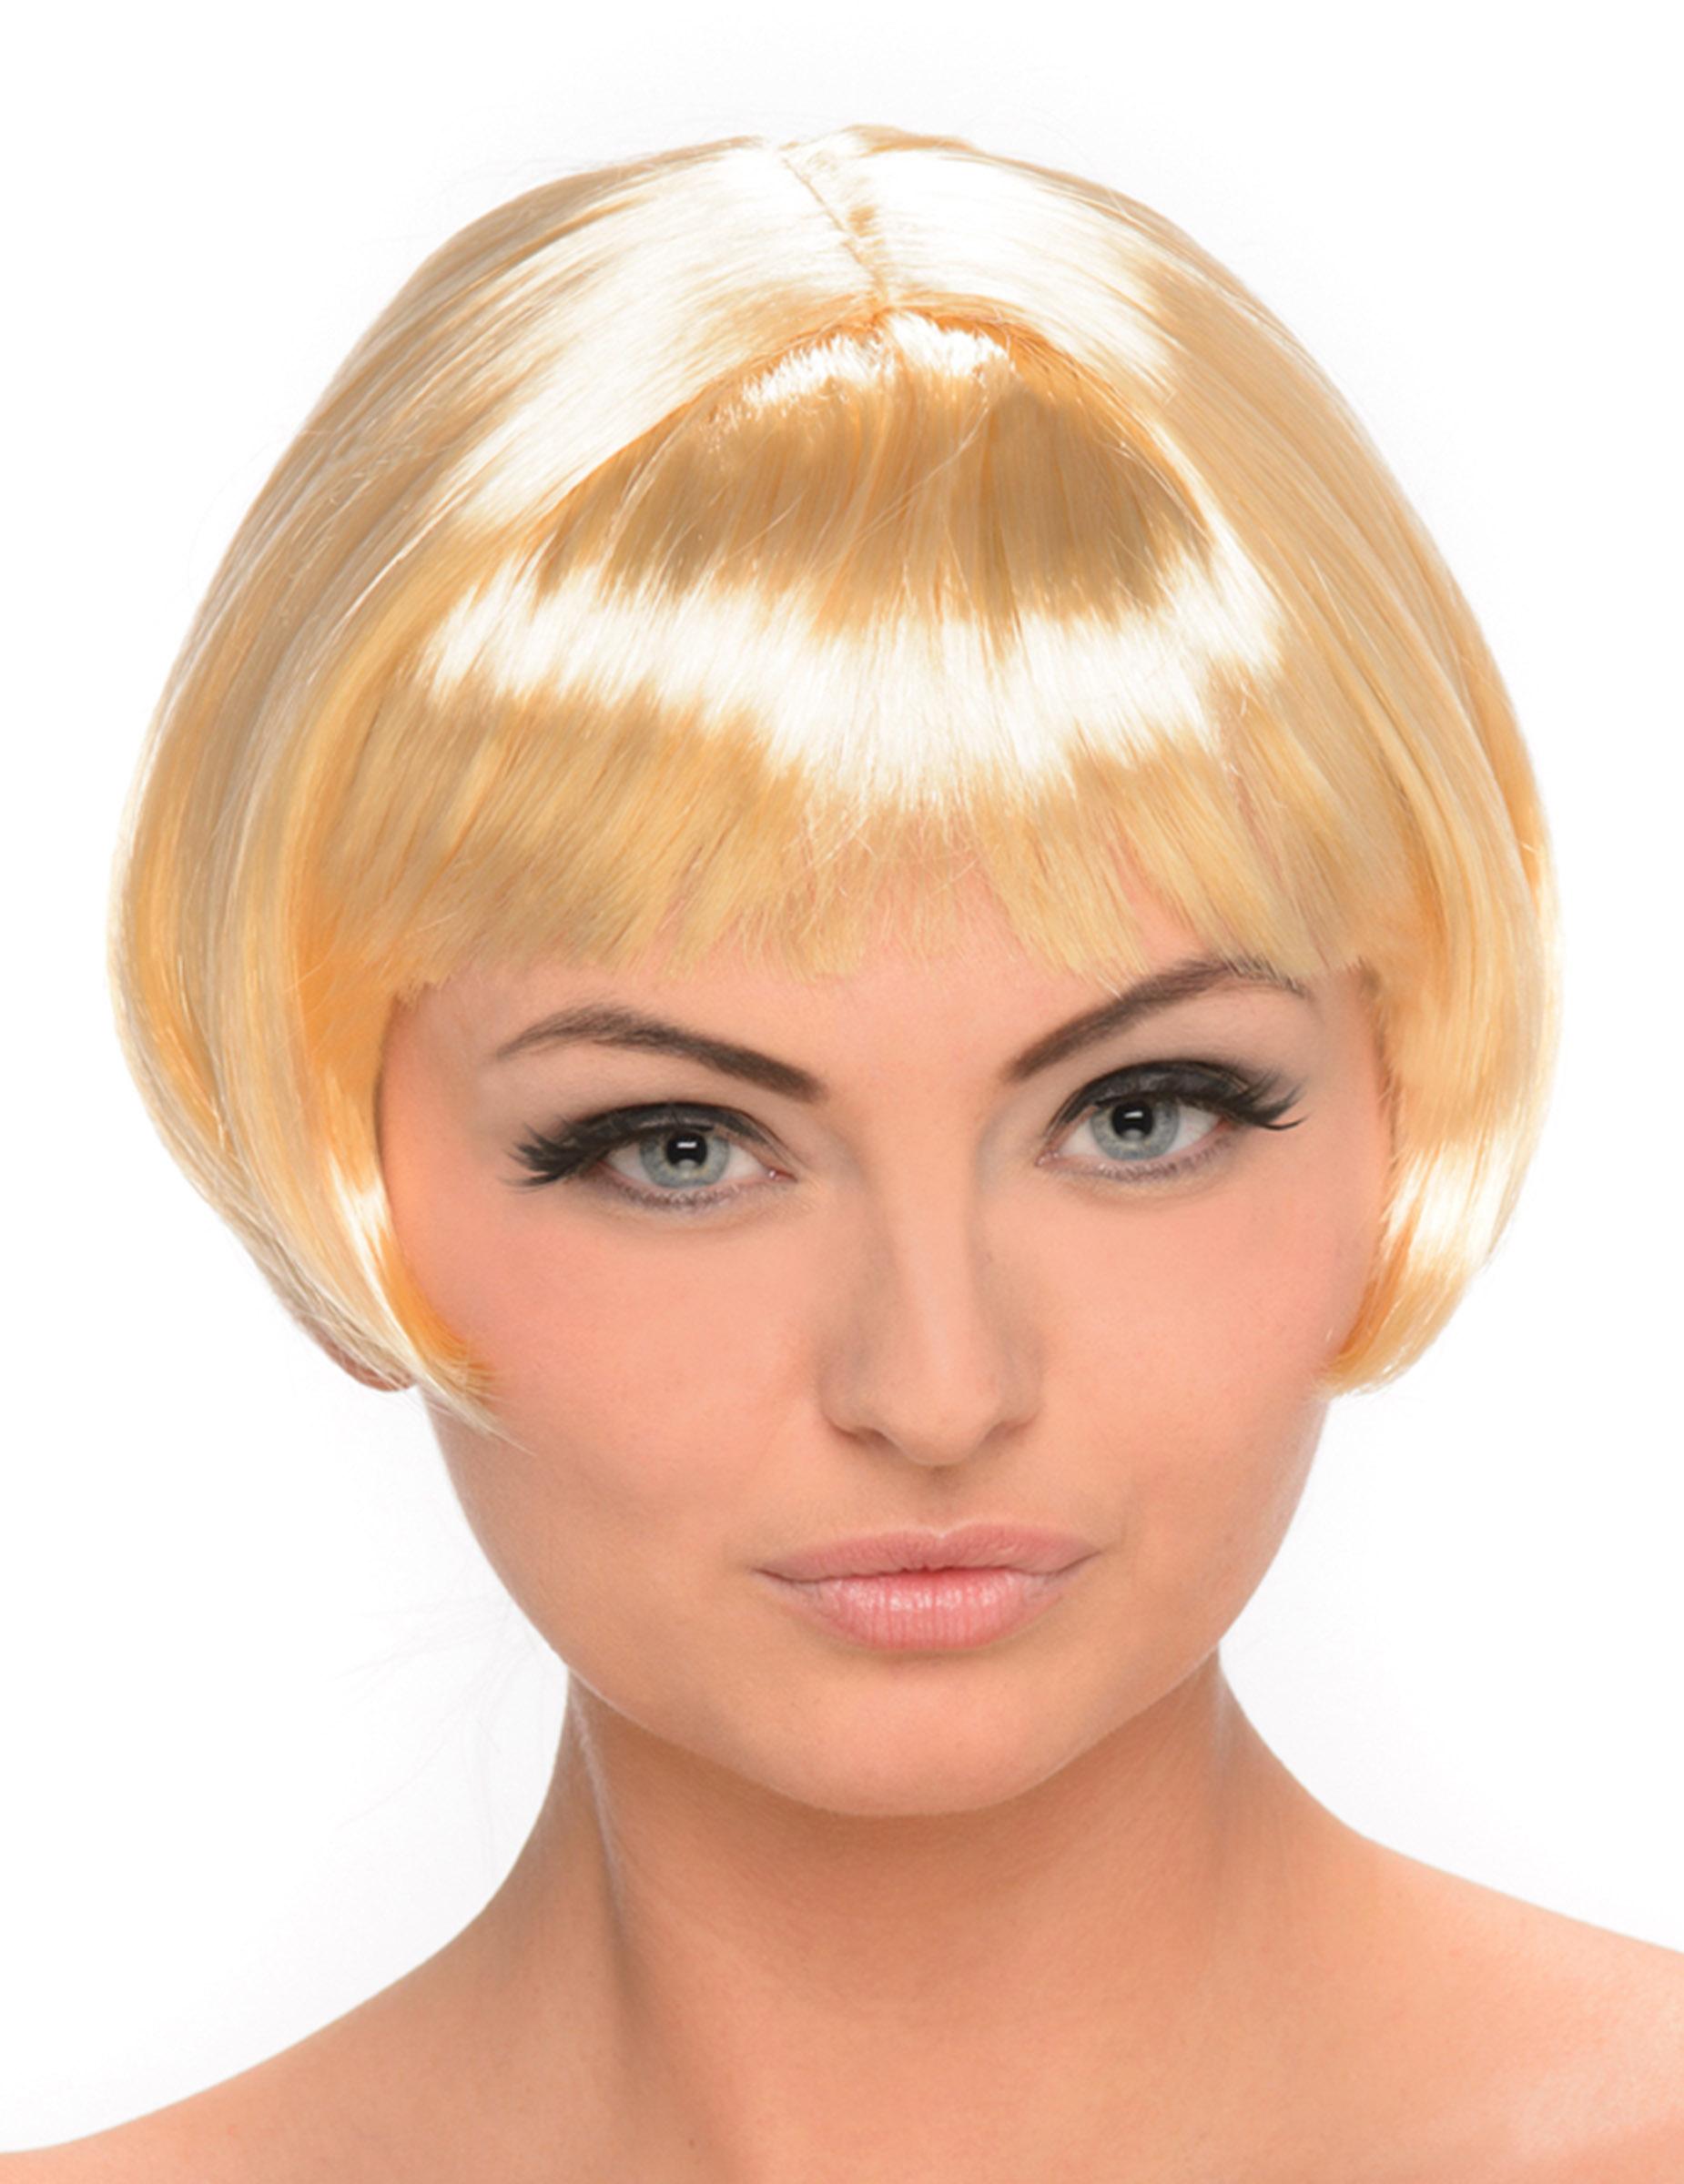 Blond Kort Bobfrisyr Peruk 6b528eb9c7a2a